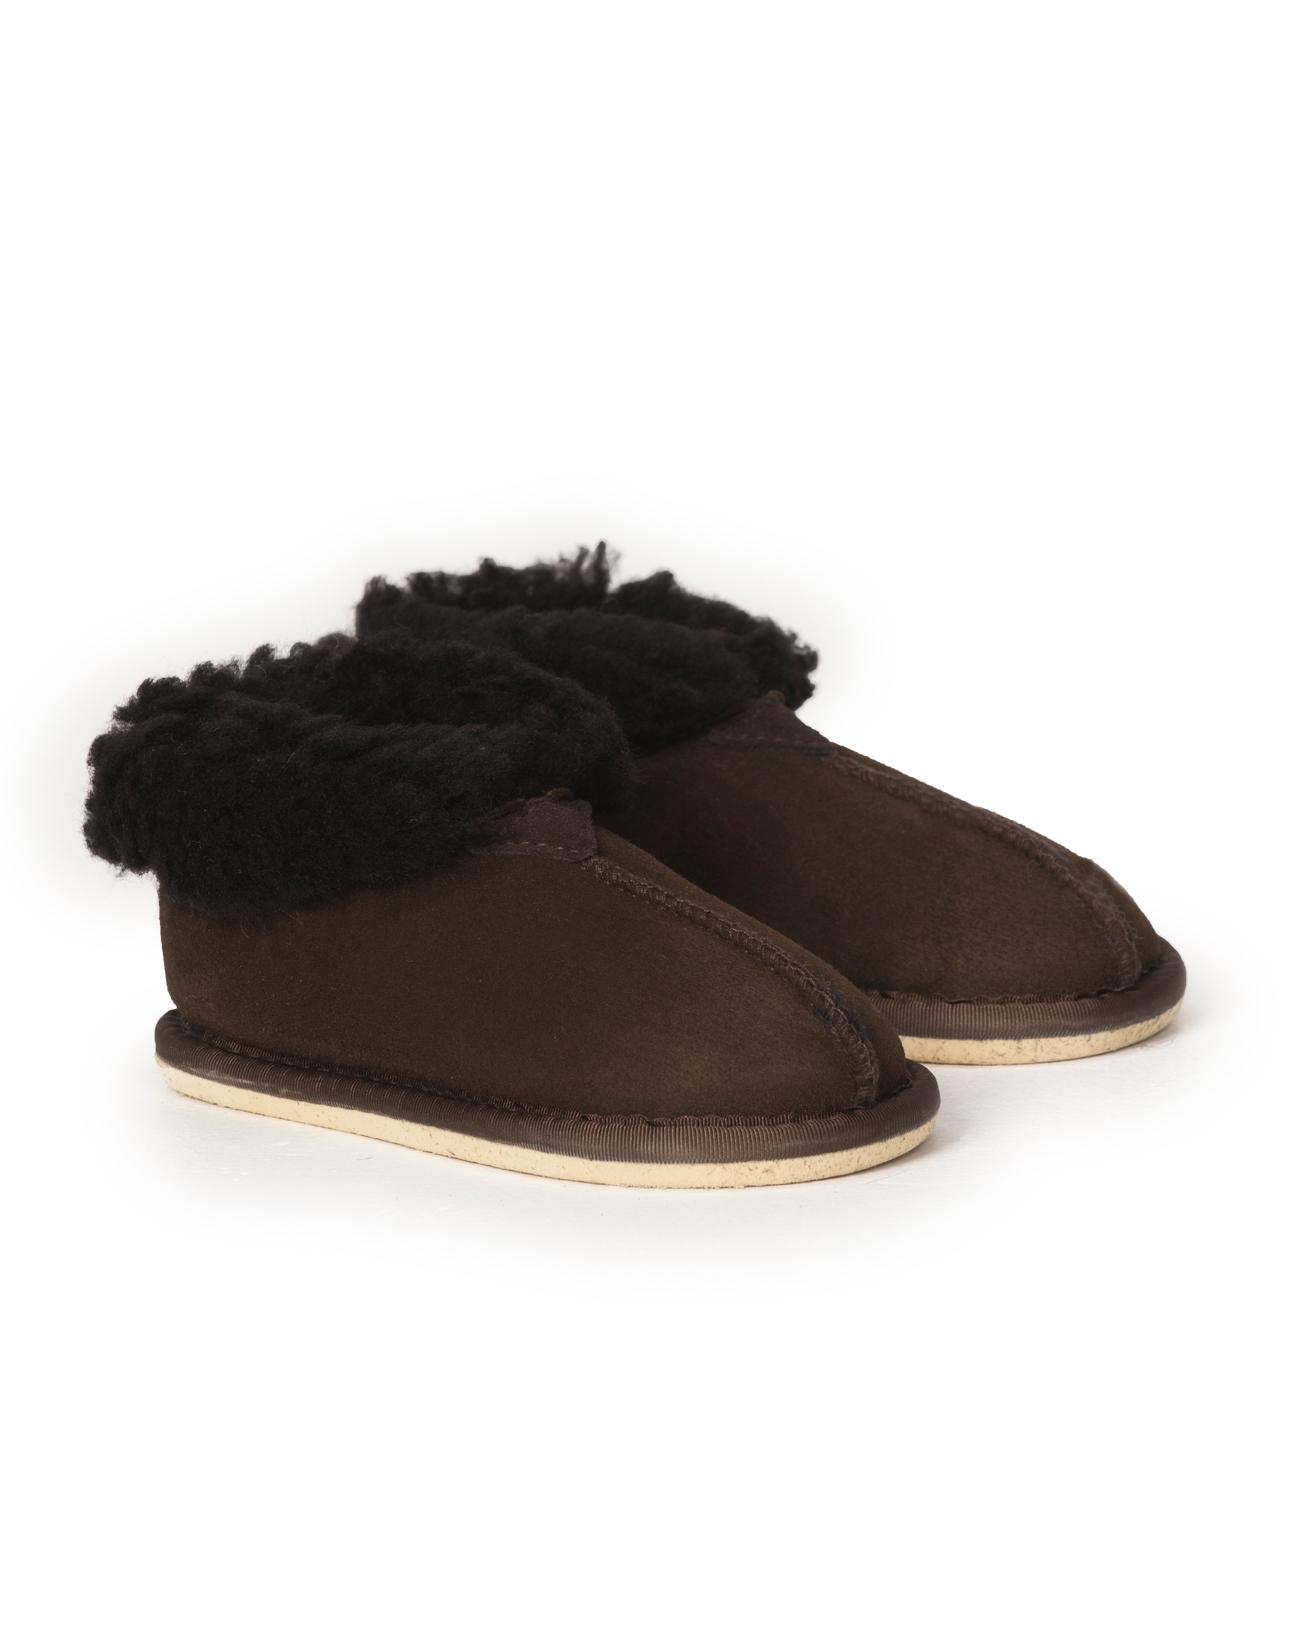 Kid's Sheepskin Bootee Slipper - Size 13-1 - Mocca - 2036